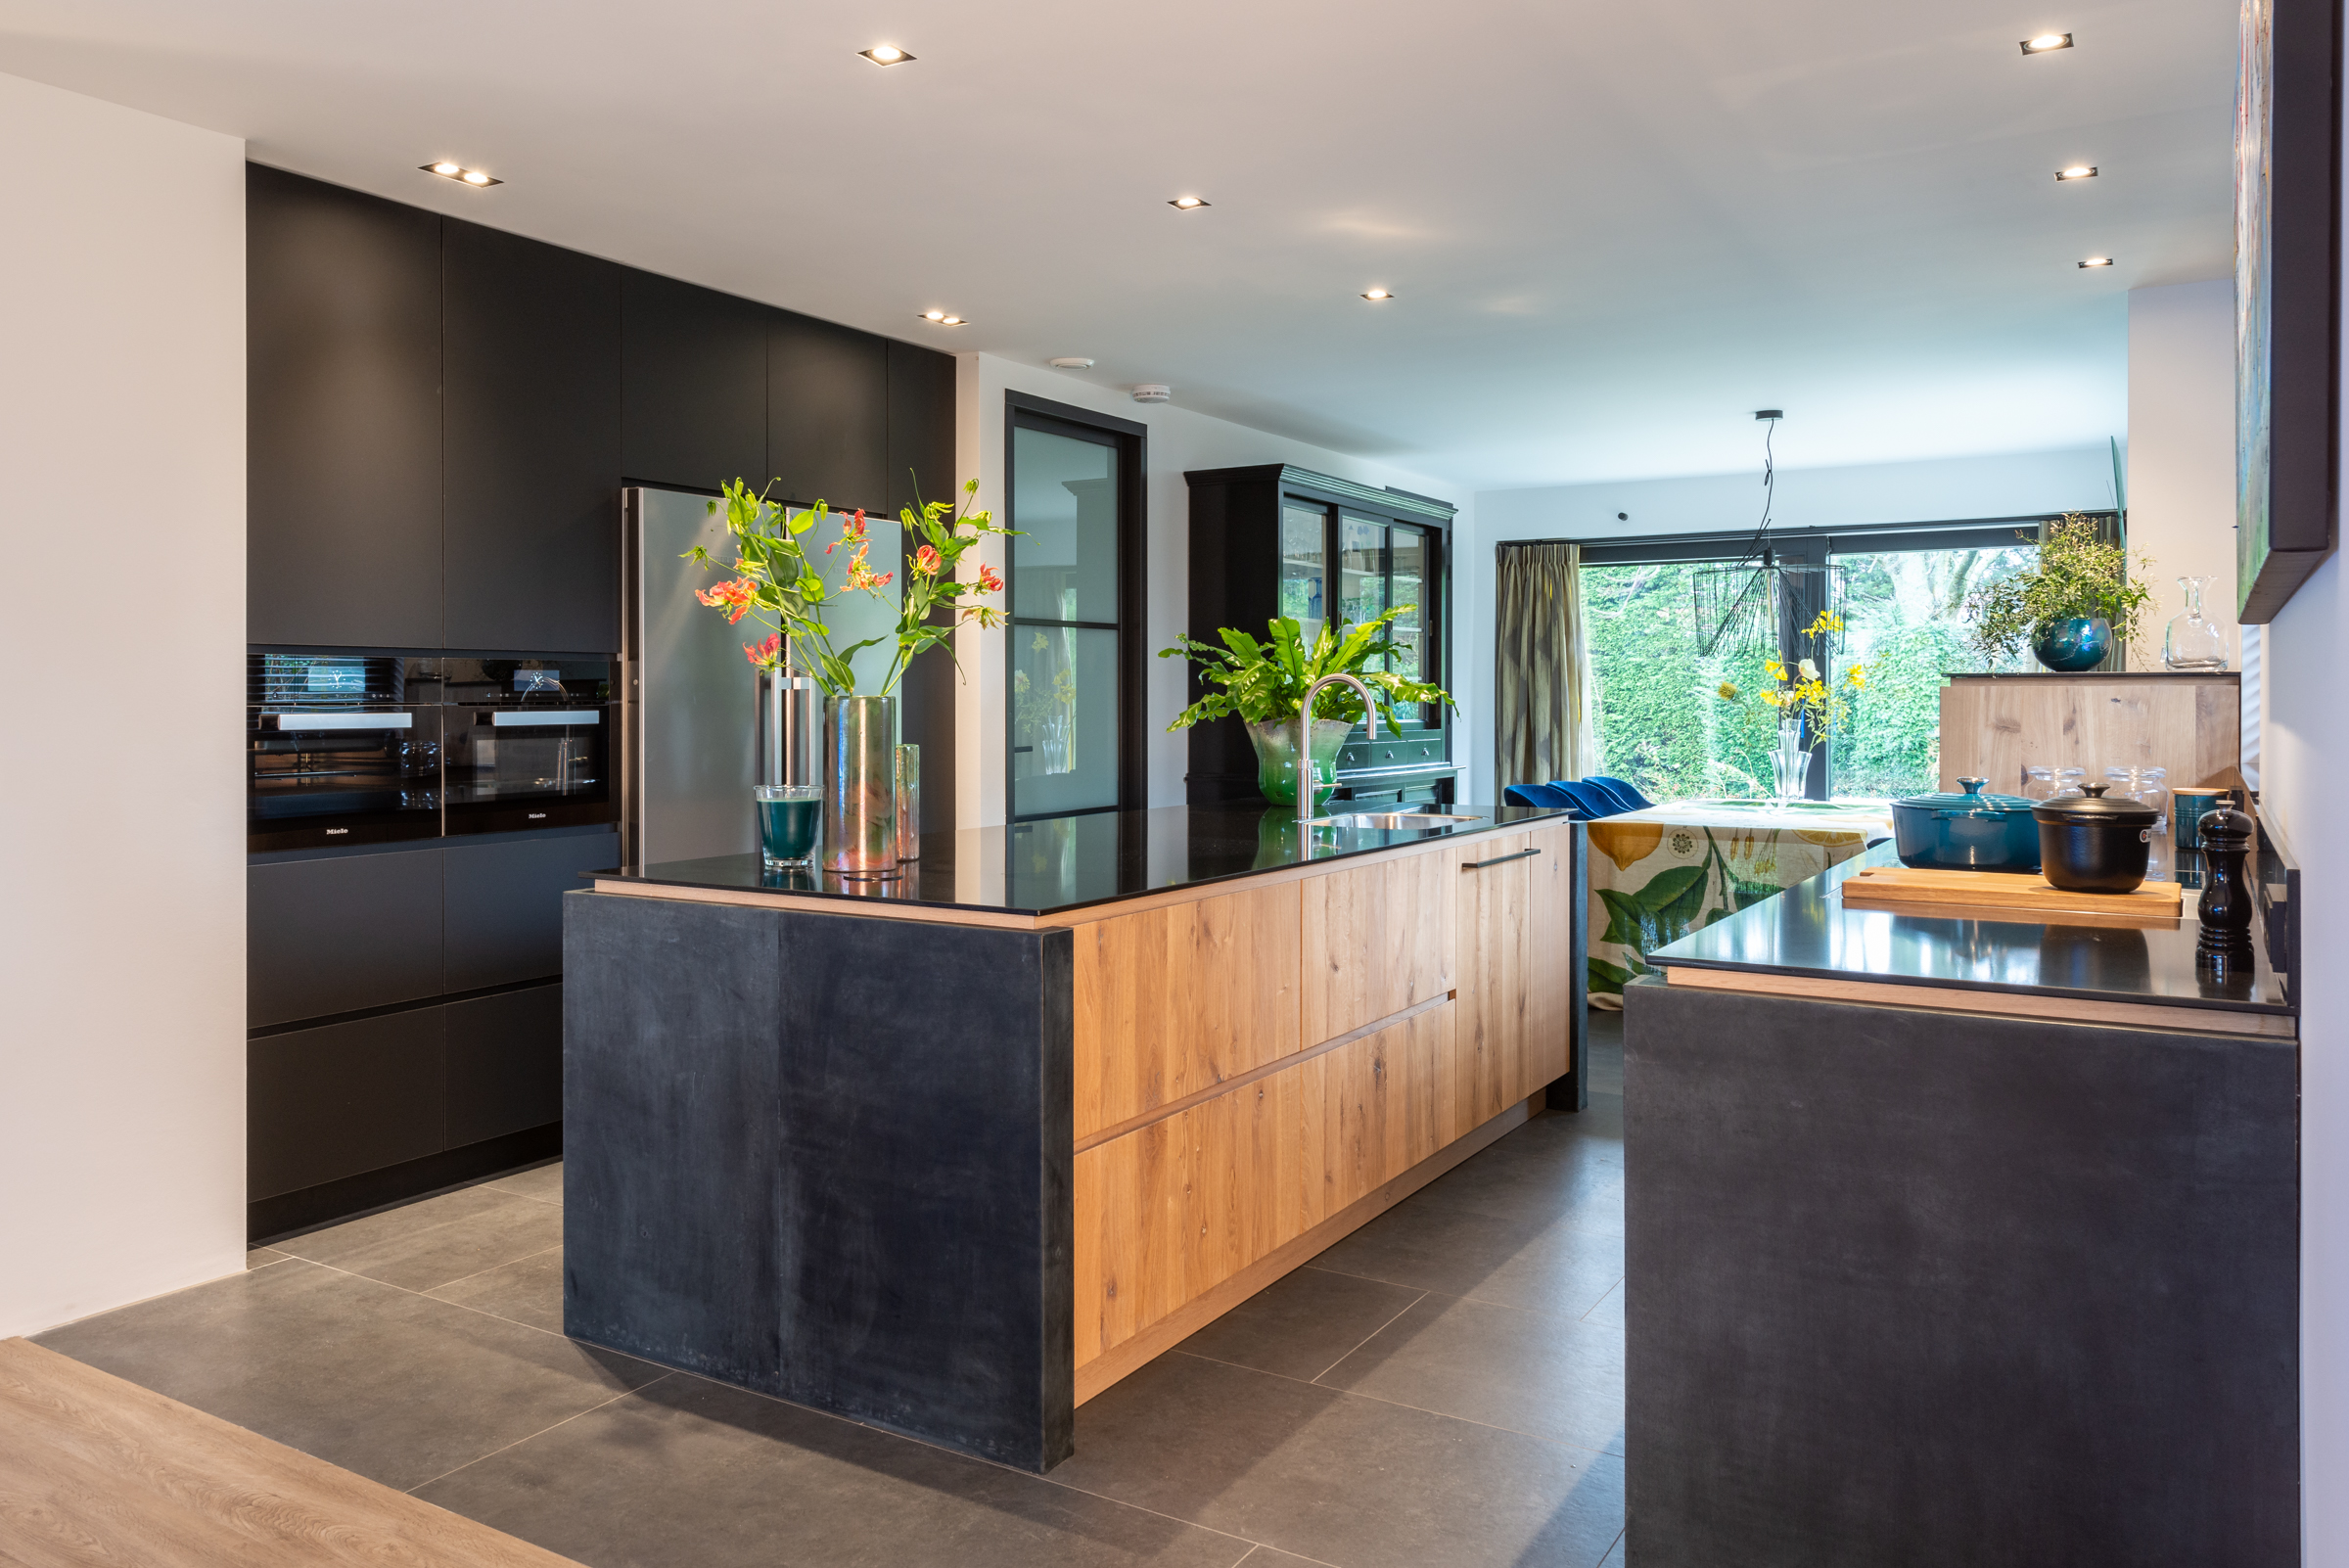 Stijlvolle moderne eiken keuken met keukeneiland